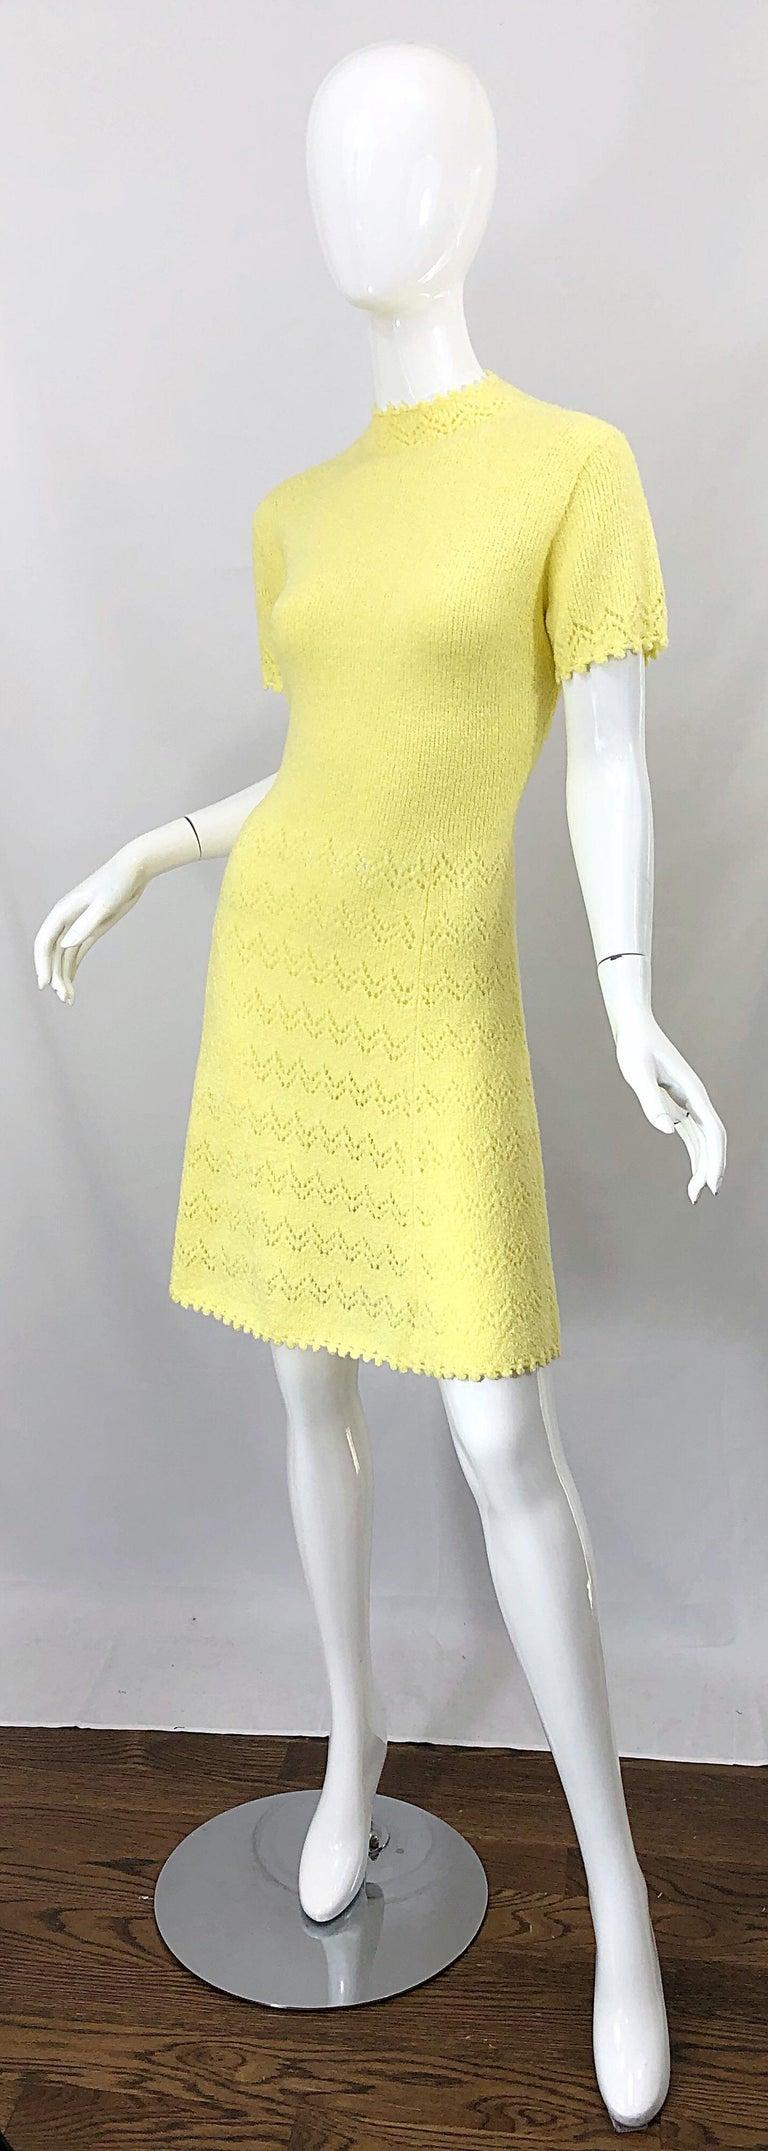 1960s St John Canary Yellow Santana Knit Mod Crochet Vintage A Line 60s Dress For Sale 1